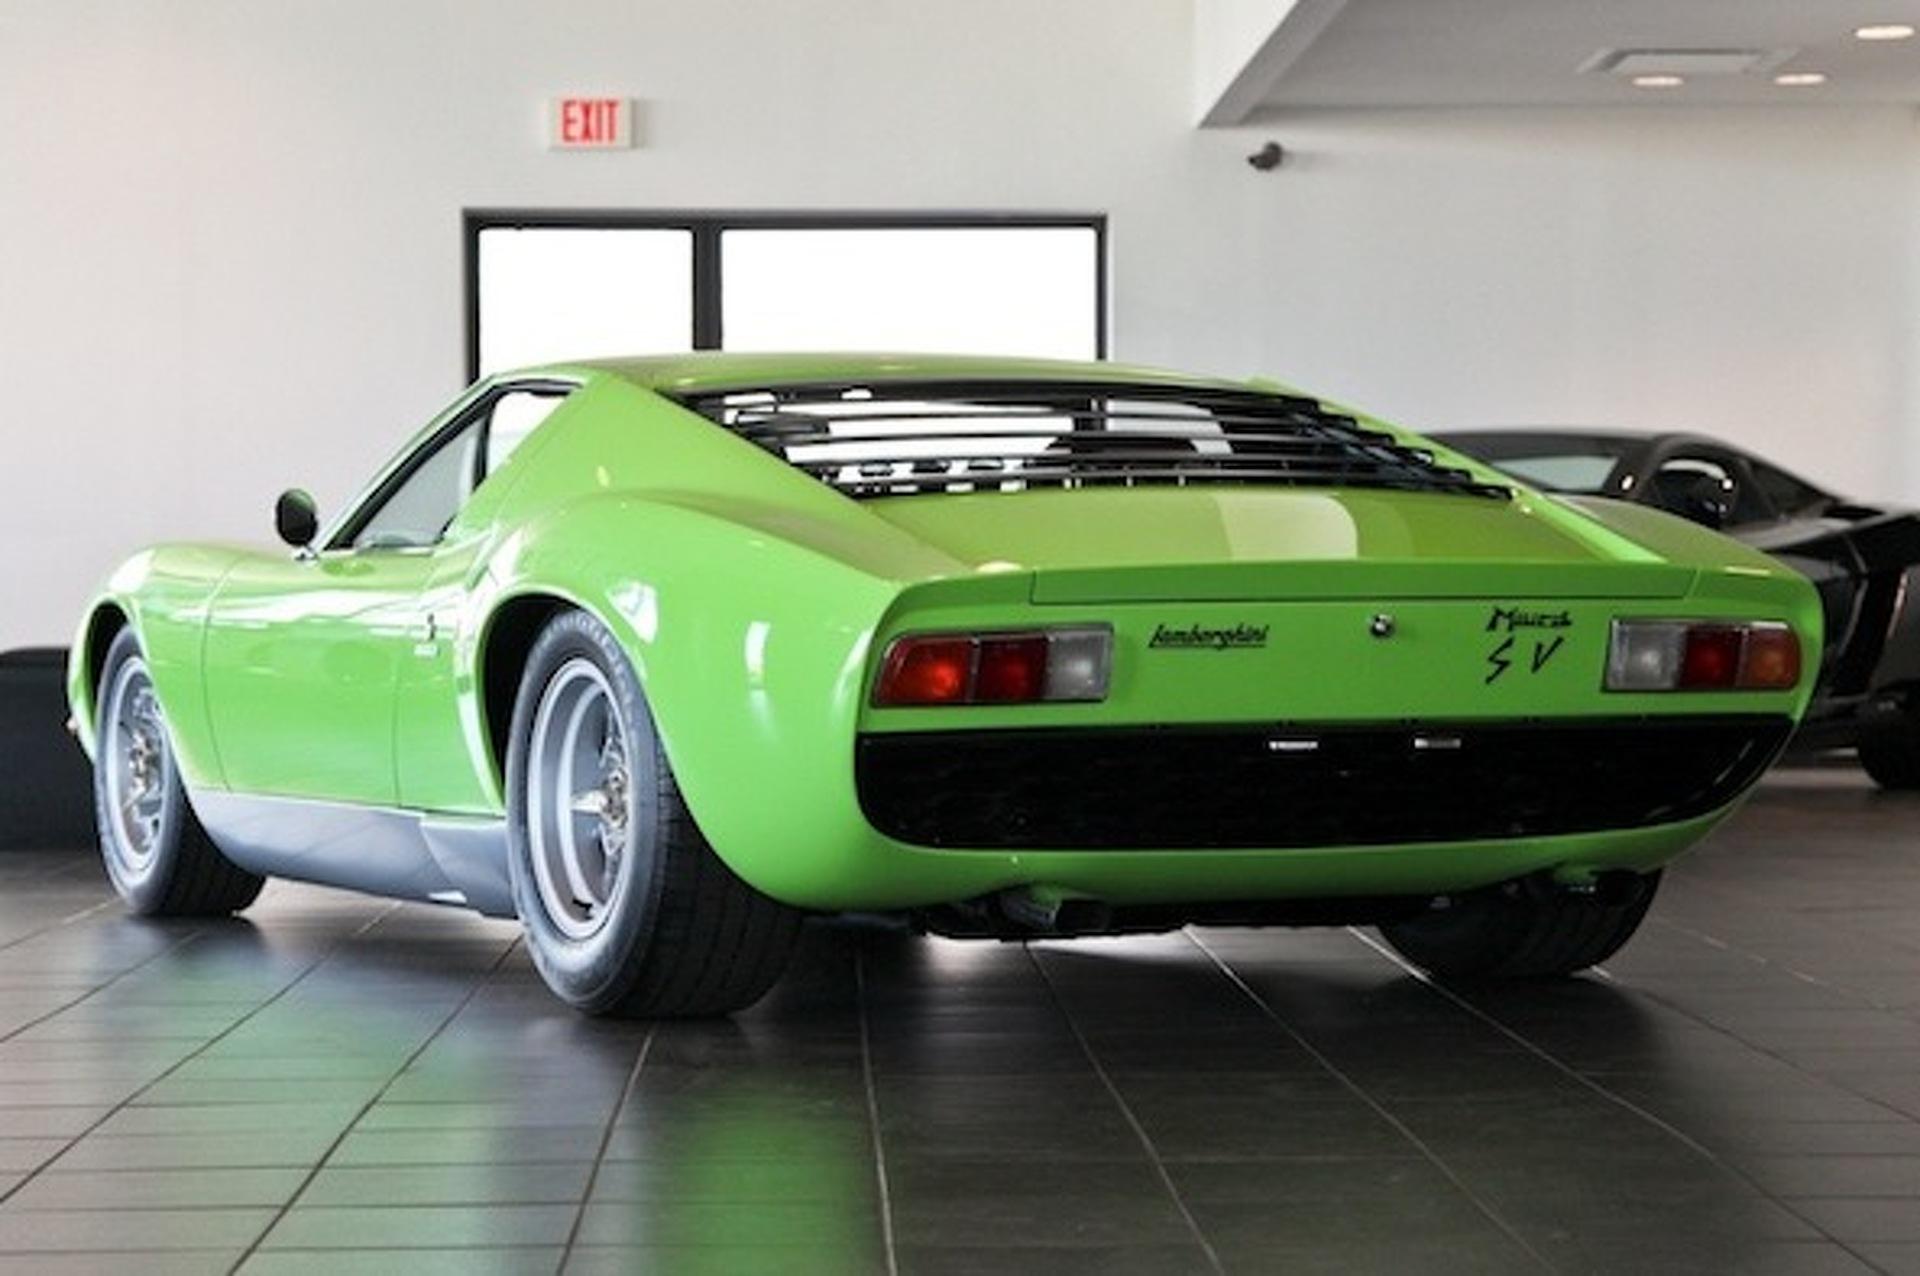 For Sale 1969 Minty Green Lamborghini Miura Sv Motor1 Com Photos